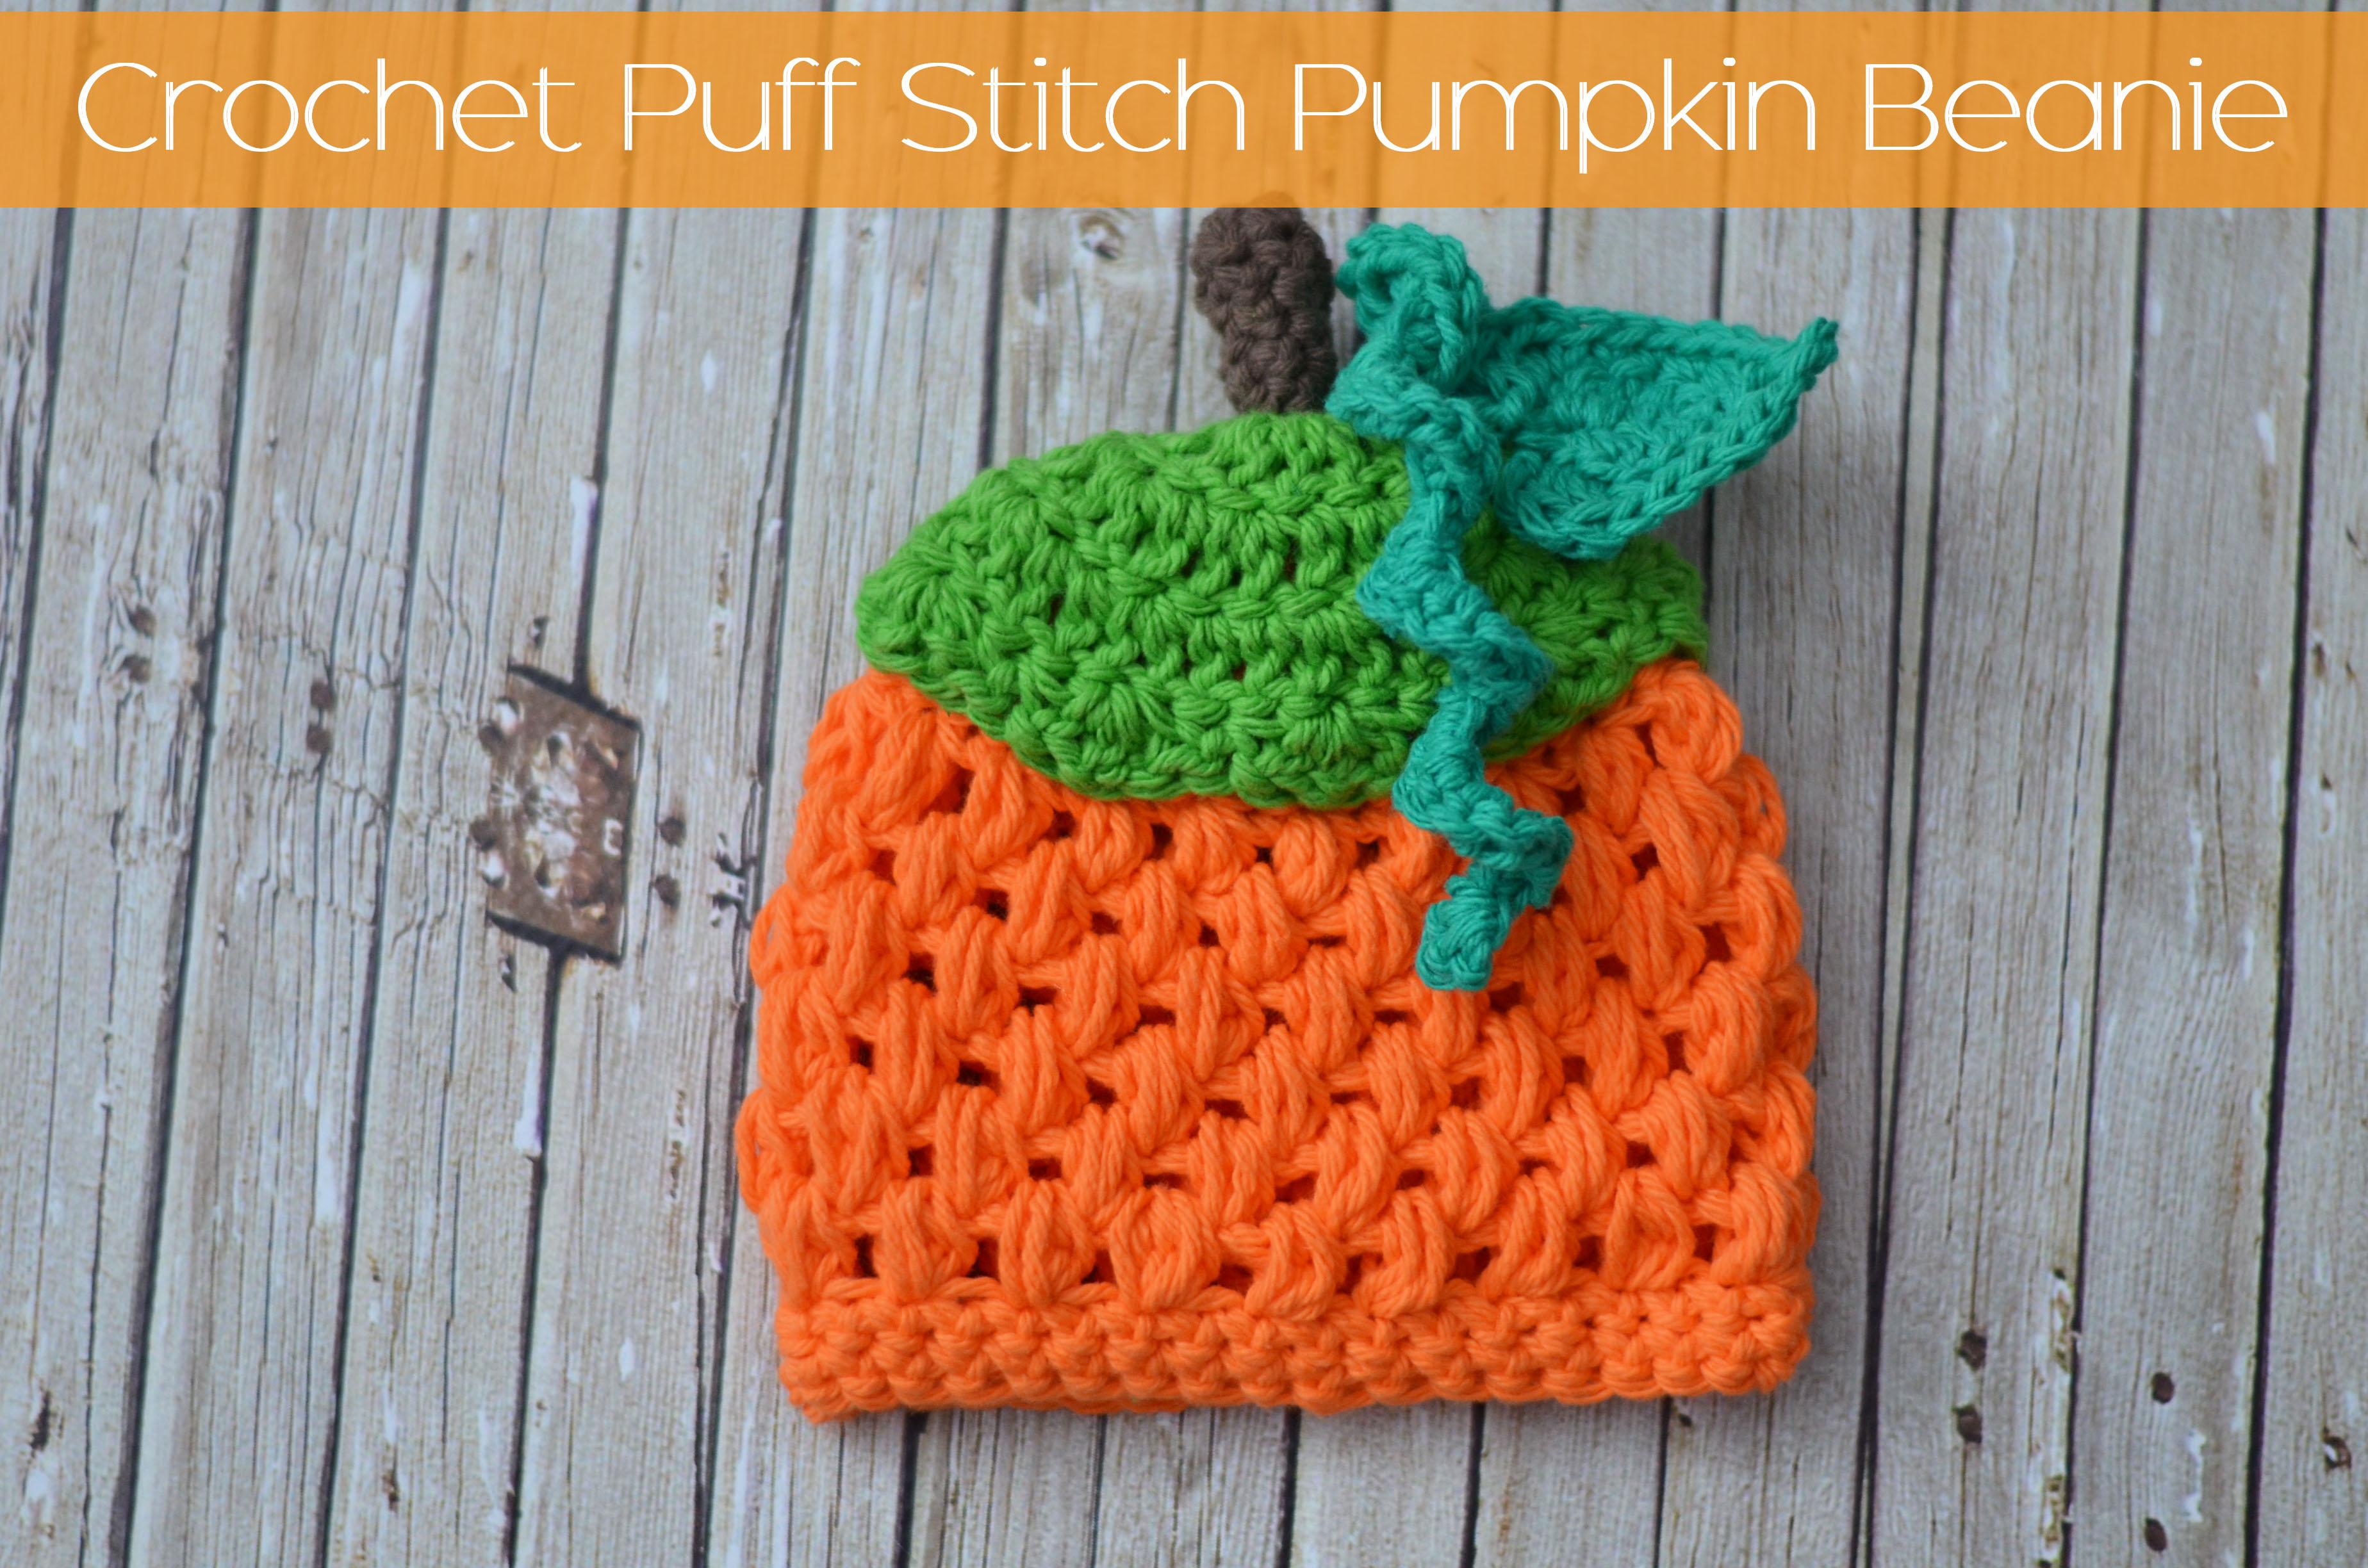 Crochet puff stitch pumpkin beanie free pattern the stitchin mommy bankloansurffo Gallery